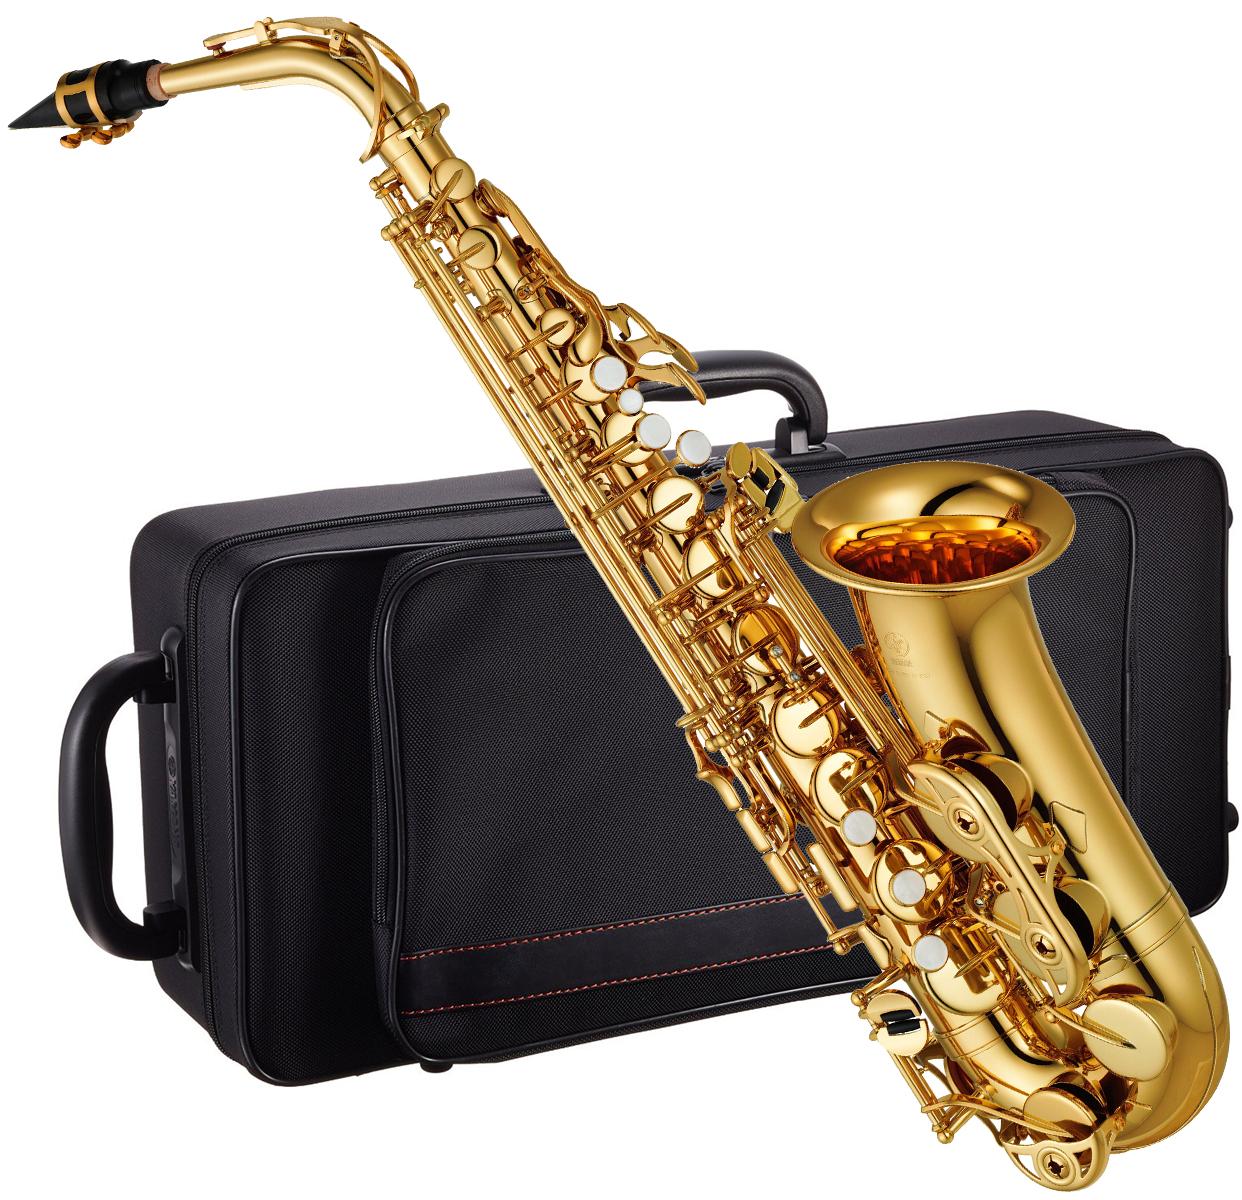 YAMAHA ( ヤマハ 管体 ) YAS-380 アルトサックス 本体 新品 管楽器 saxophone ゴールド 管体 ネック E♭ 本体 初心者 サックス YAS380 alto saxophone アルトサクソフォン 送料無料, PECHKA:2a91feed --- officewill.xsrv.jp